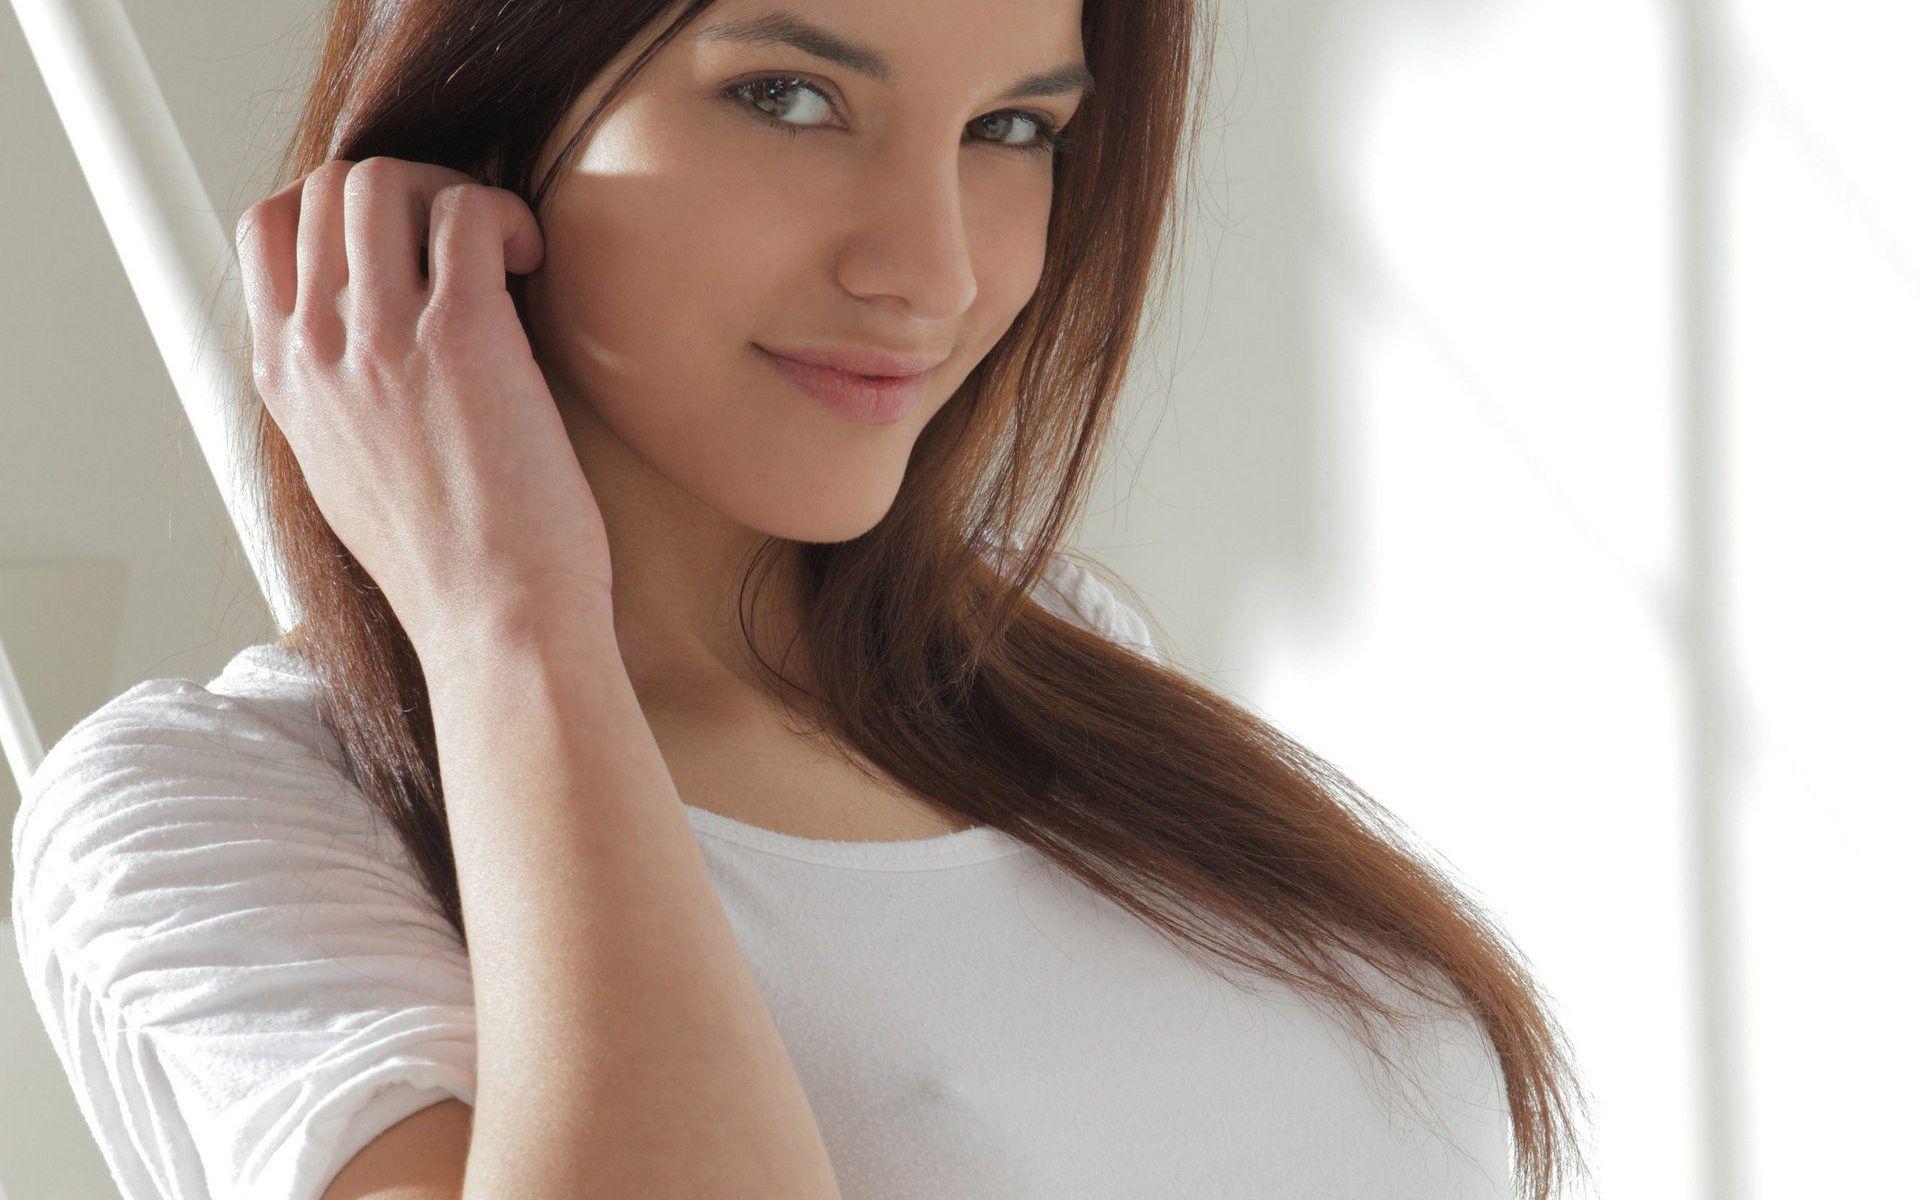 Kaylee X Art X Art Magazine Models Smiling T Shirts Wallpaper  Wallbase Cc